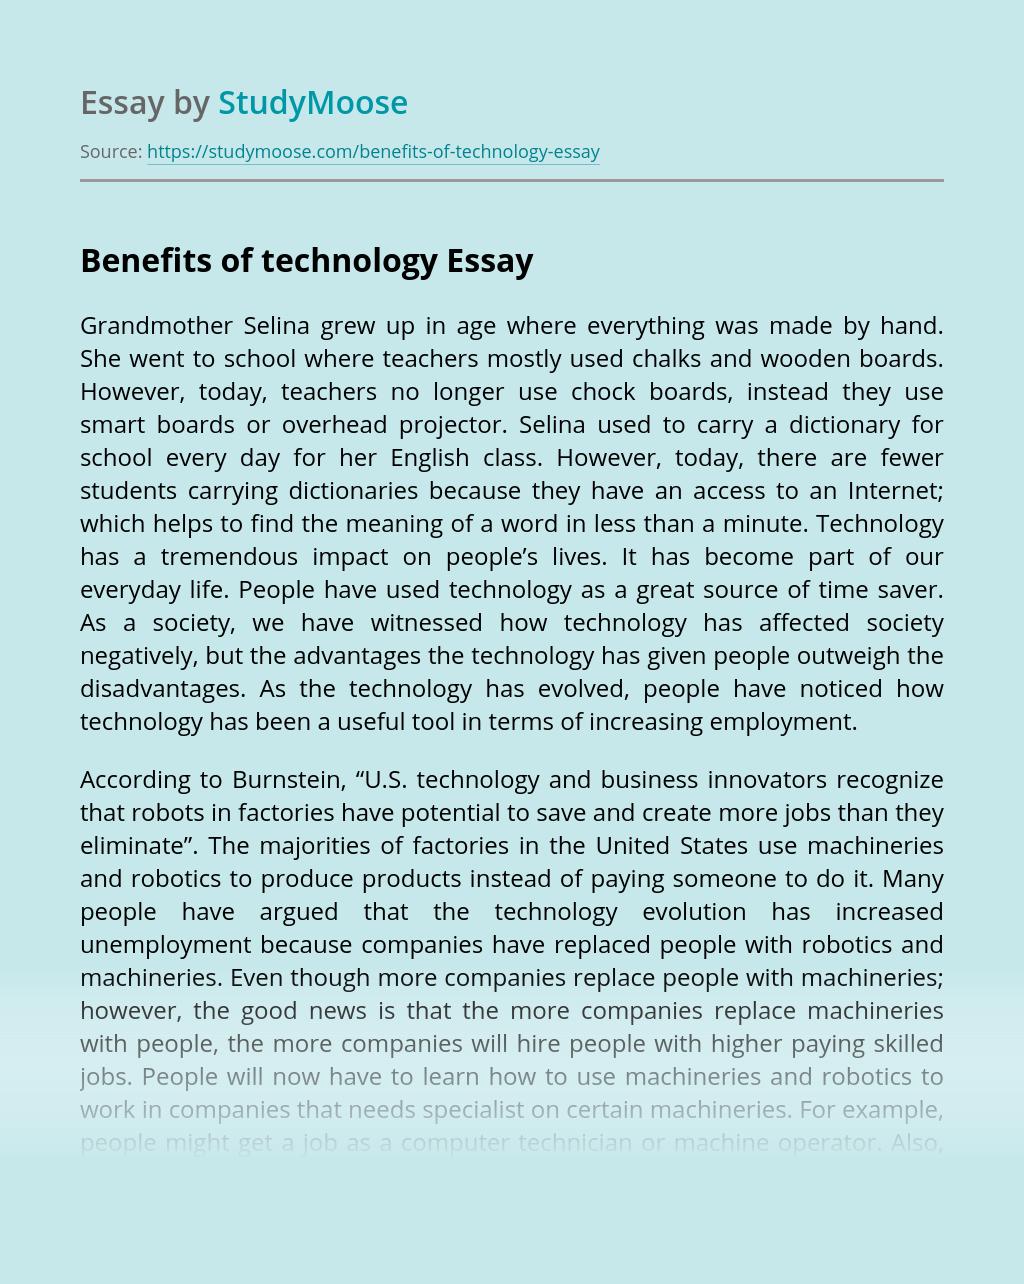 Benefits of technology